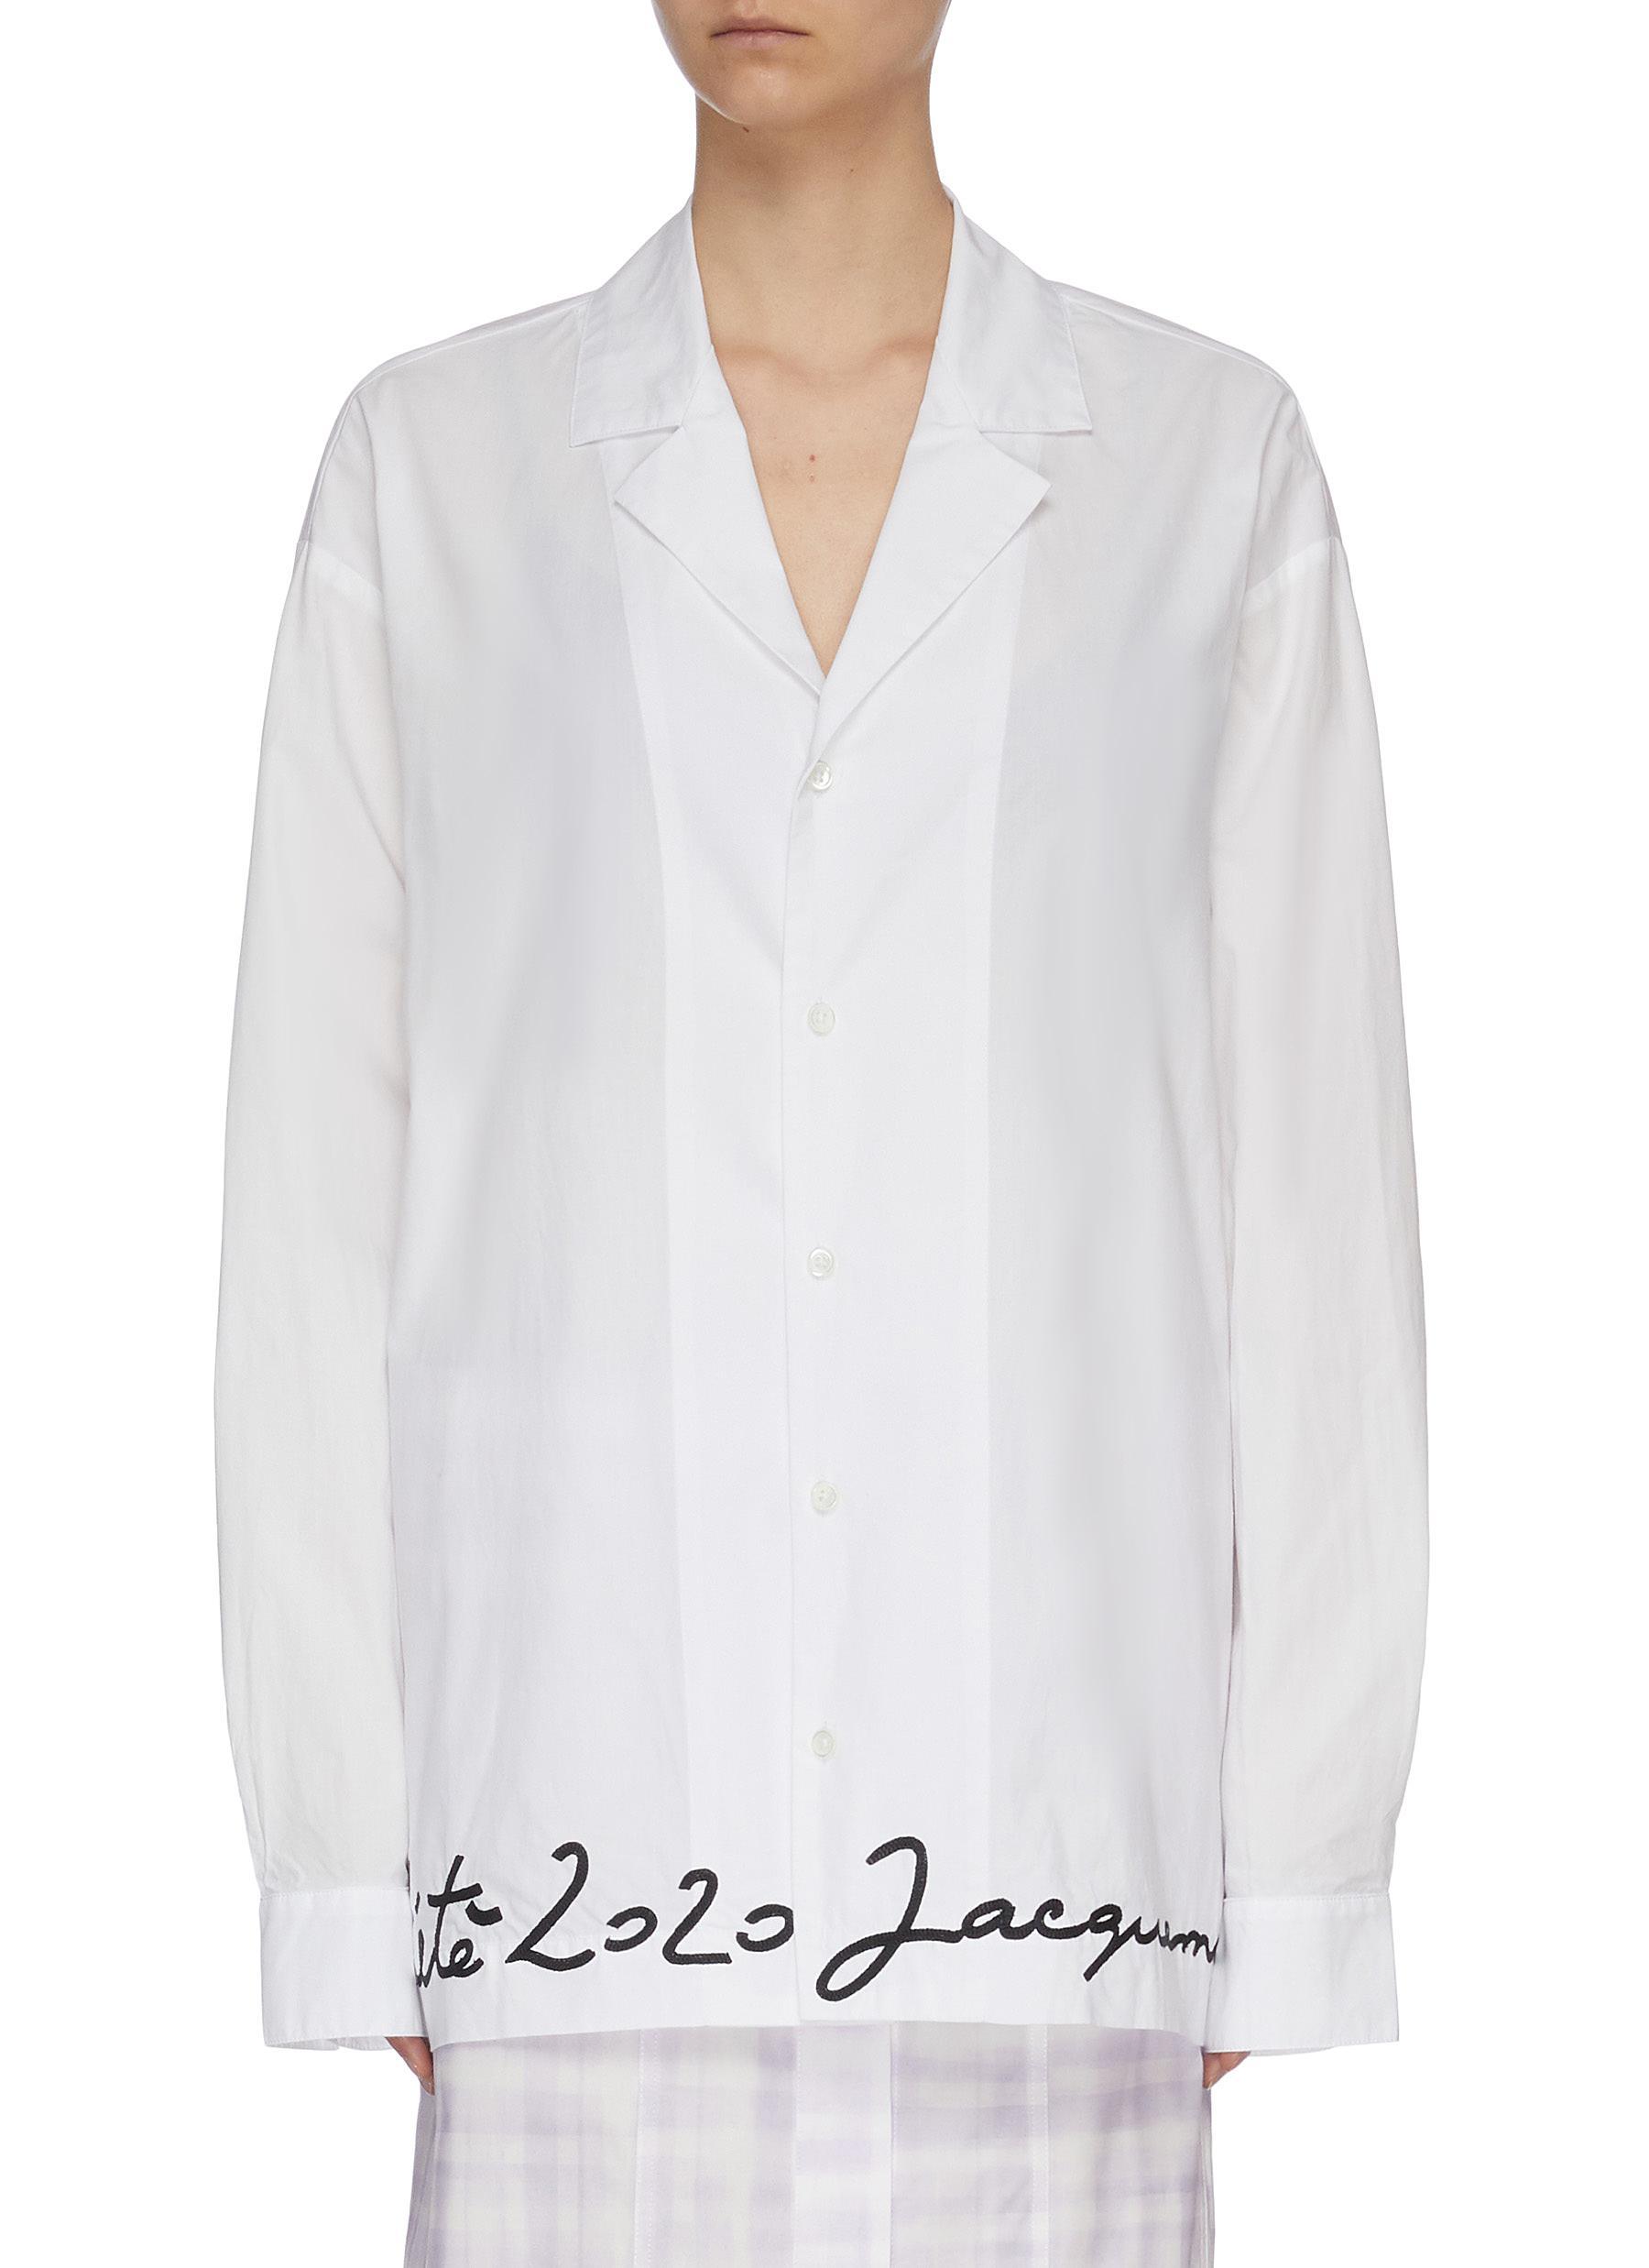 shop Jacquemus Oversized logo embroidered placket shirt online